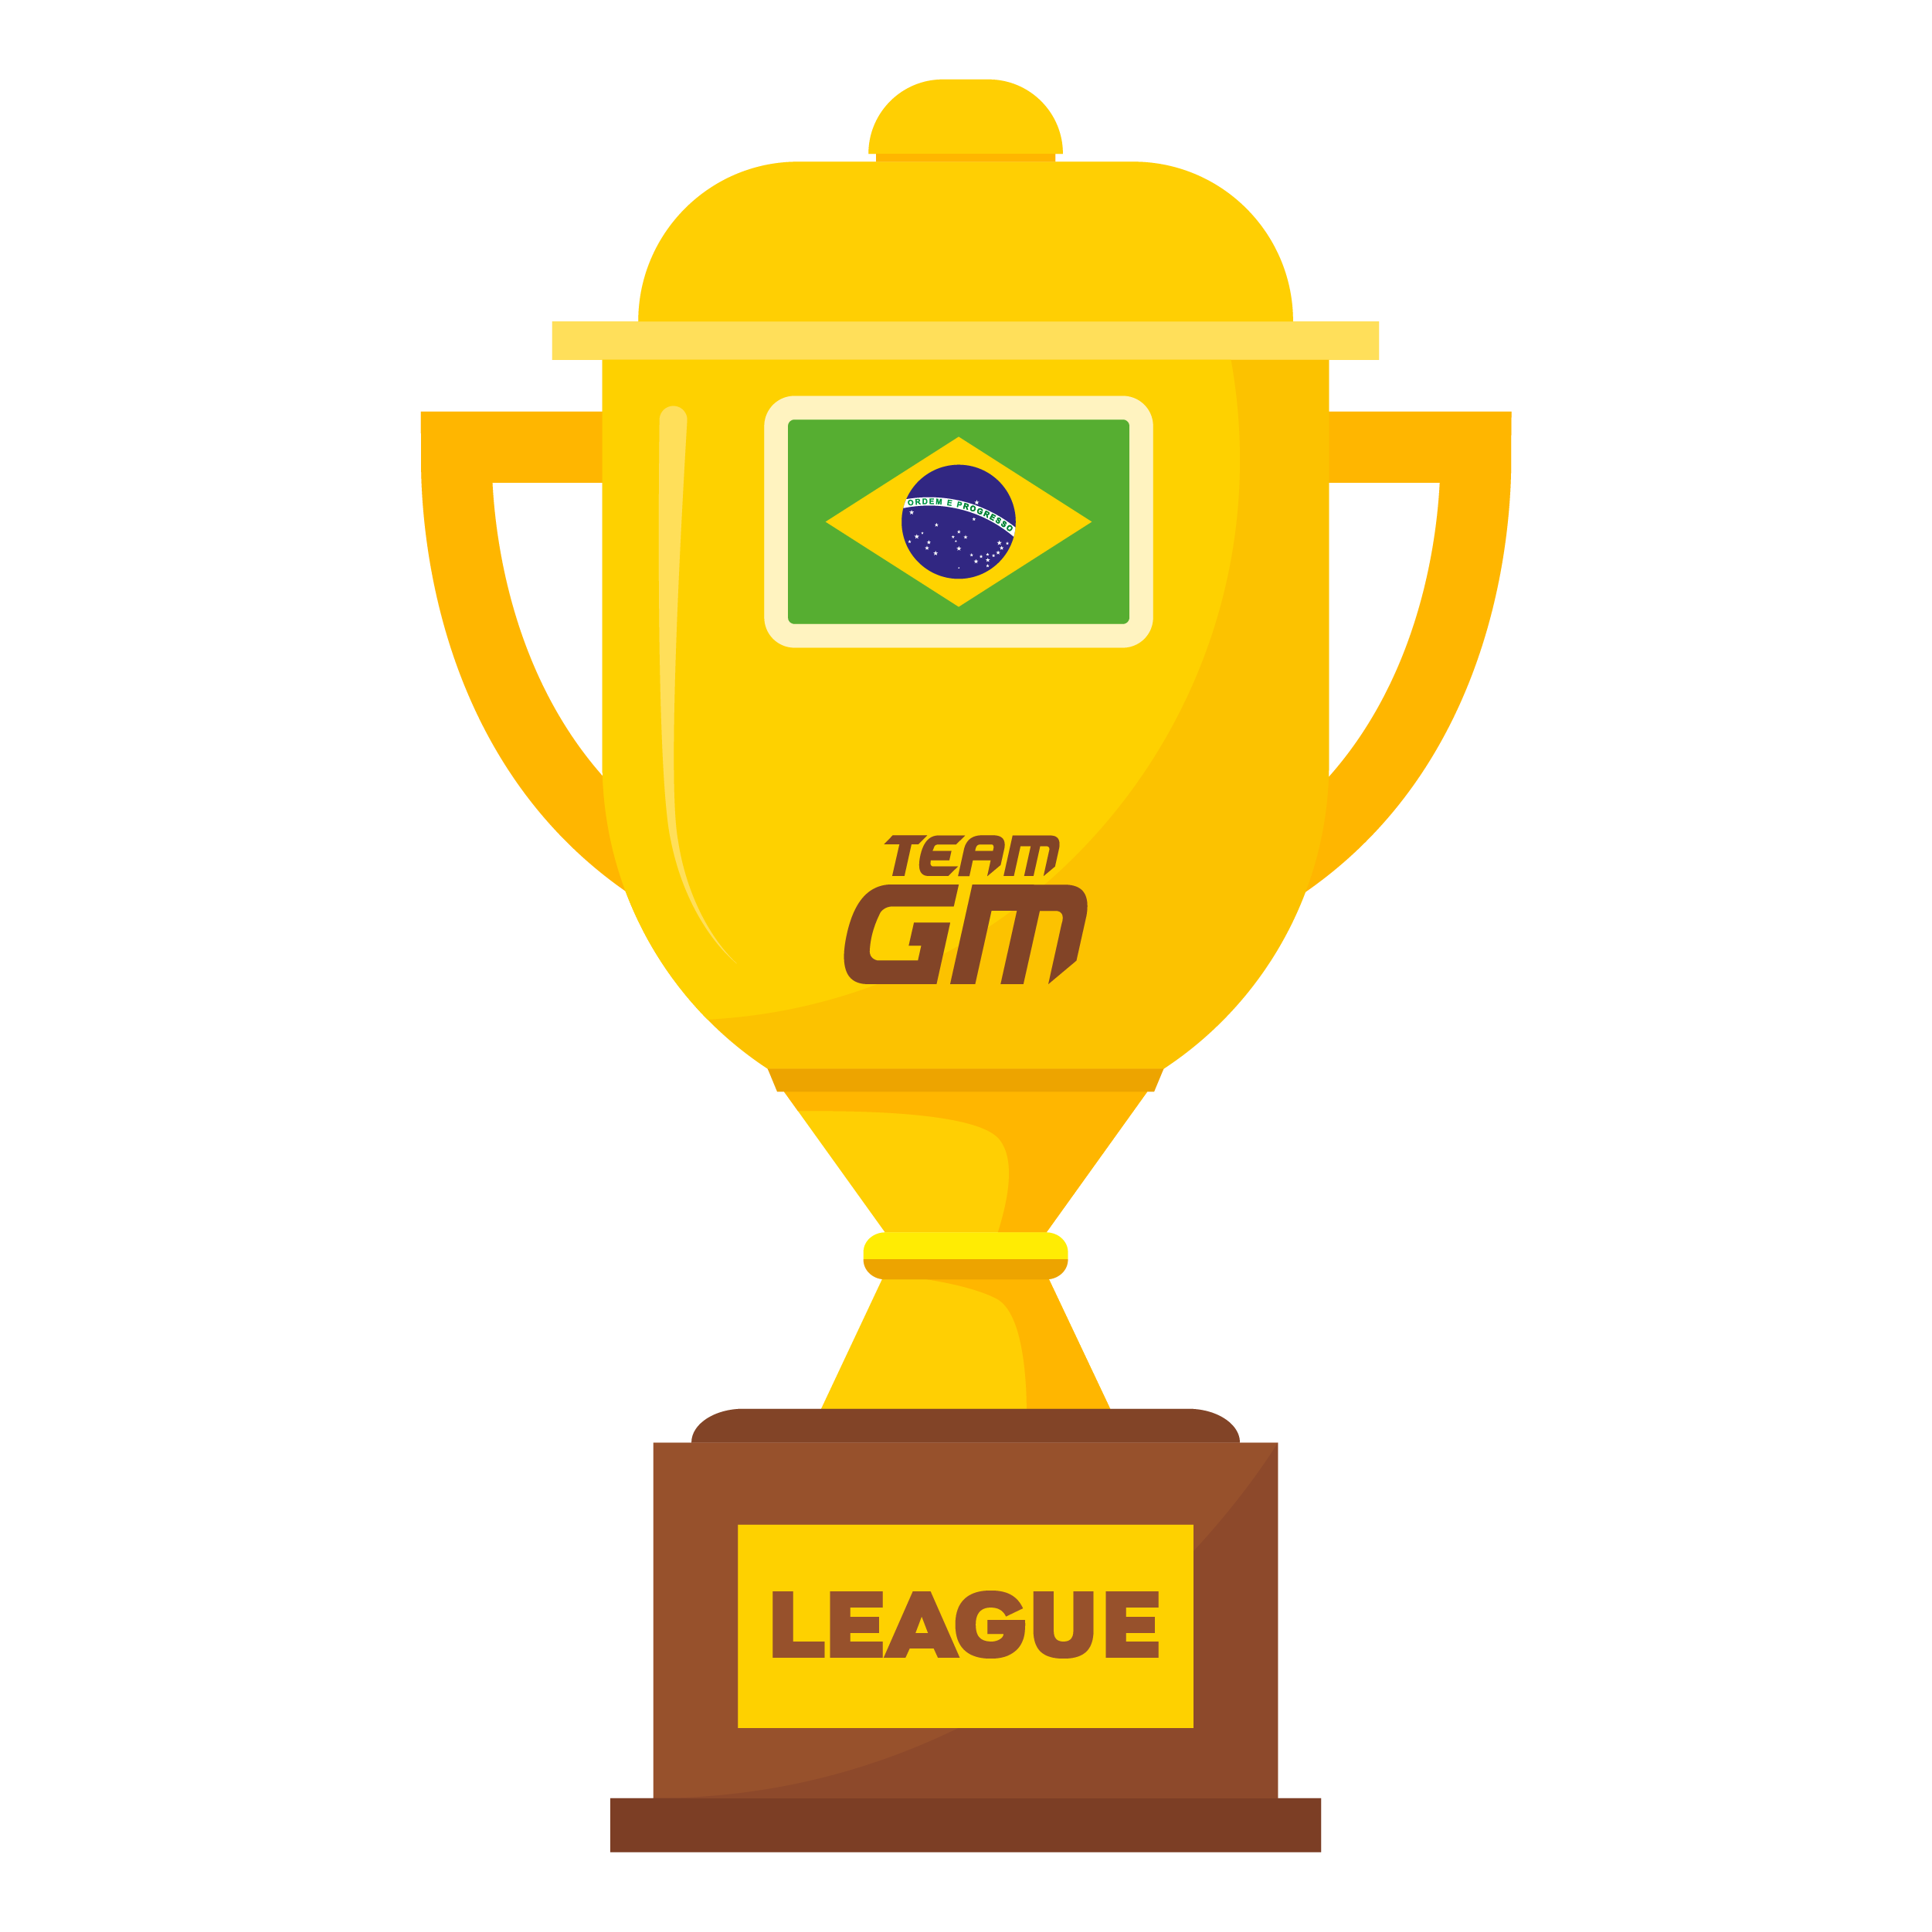 8TH - BRAZILIAN SUPER LEAGUE (B SERIE)